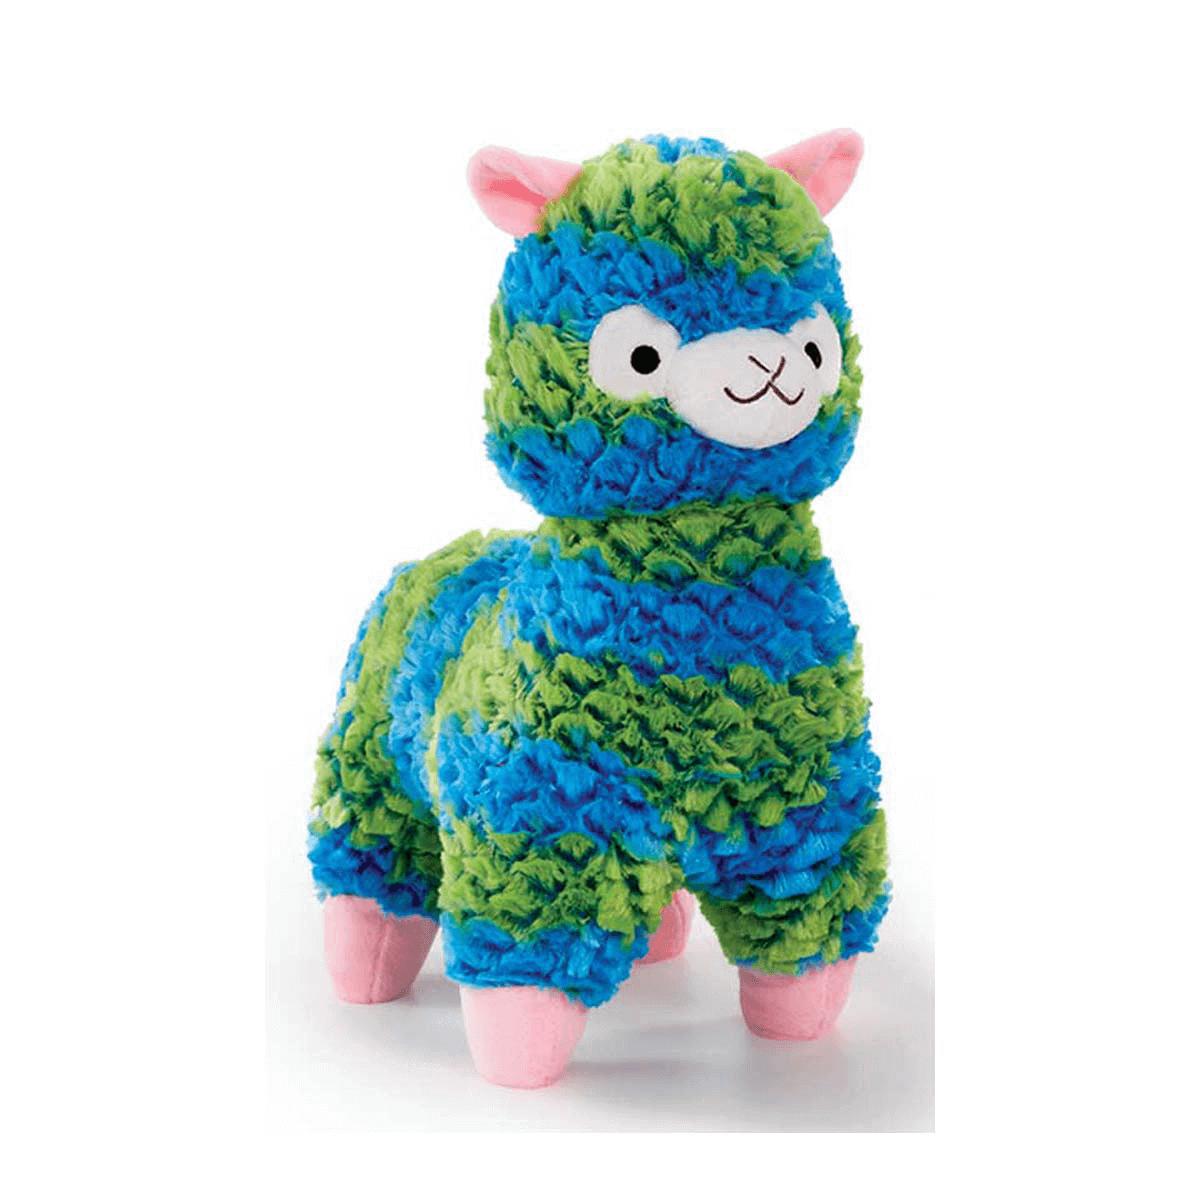 Free pattern - Elephant Snuggle - Dendennis   Crochet   Knit   Craft   1200x1200